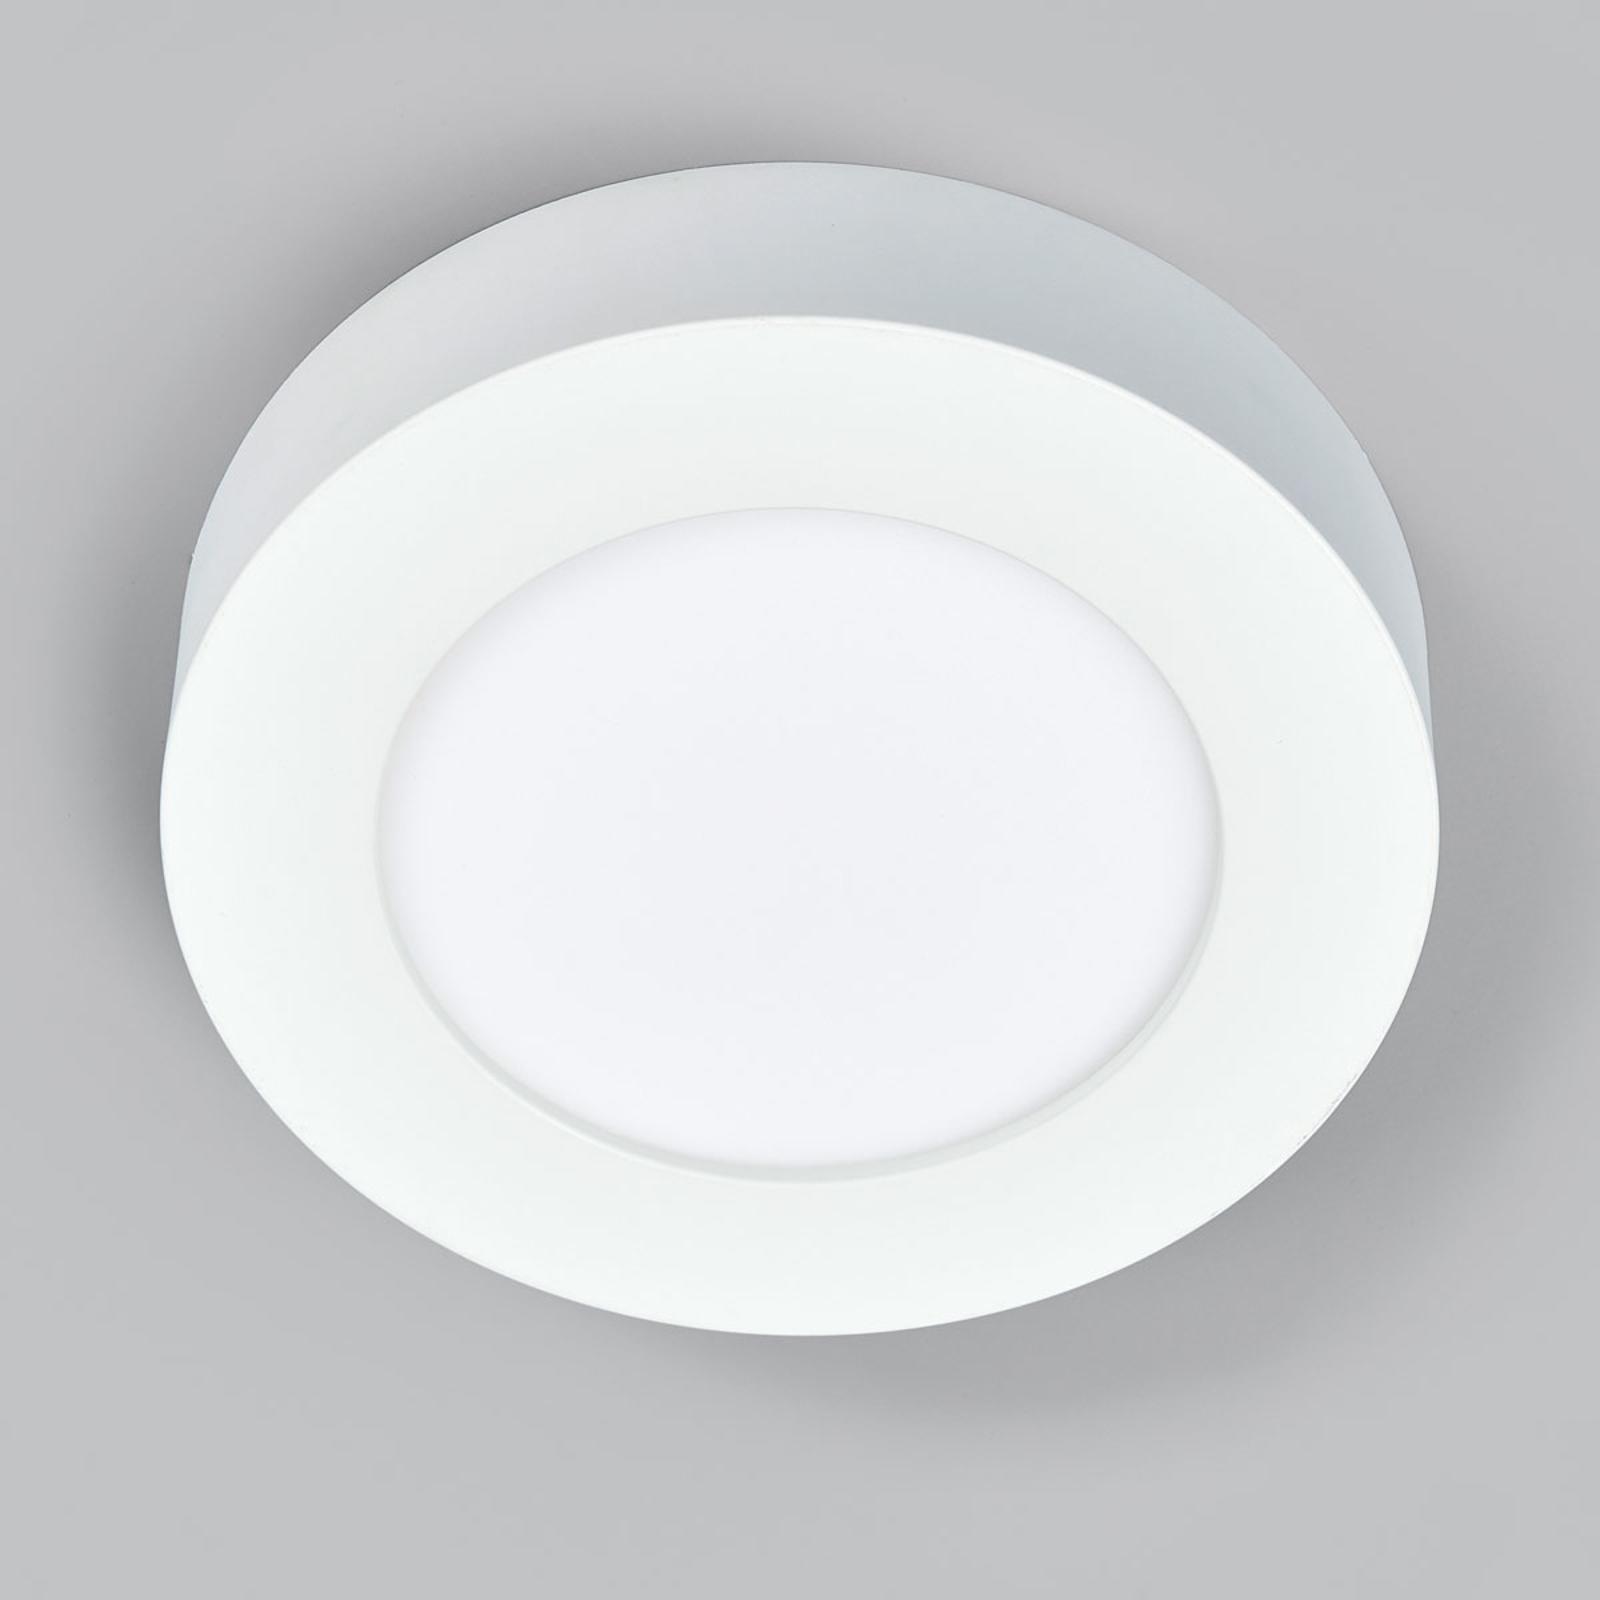 LED plafondlamp Marlo wit 4.000K rond 18,2 cm